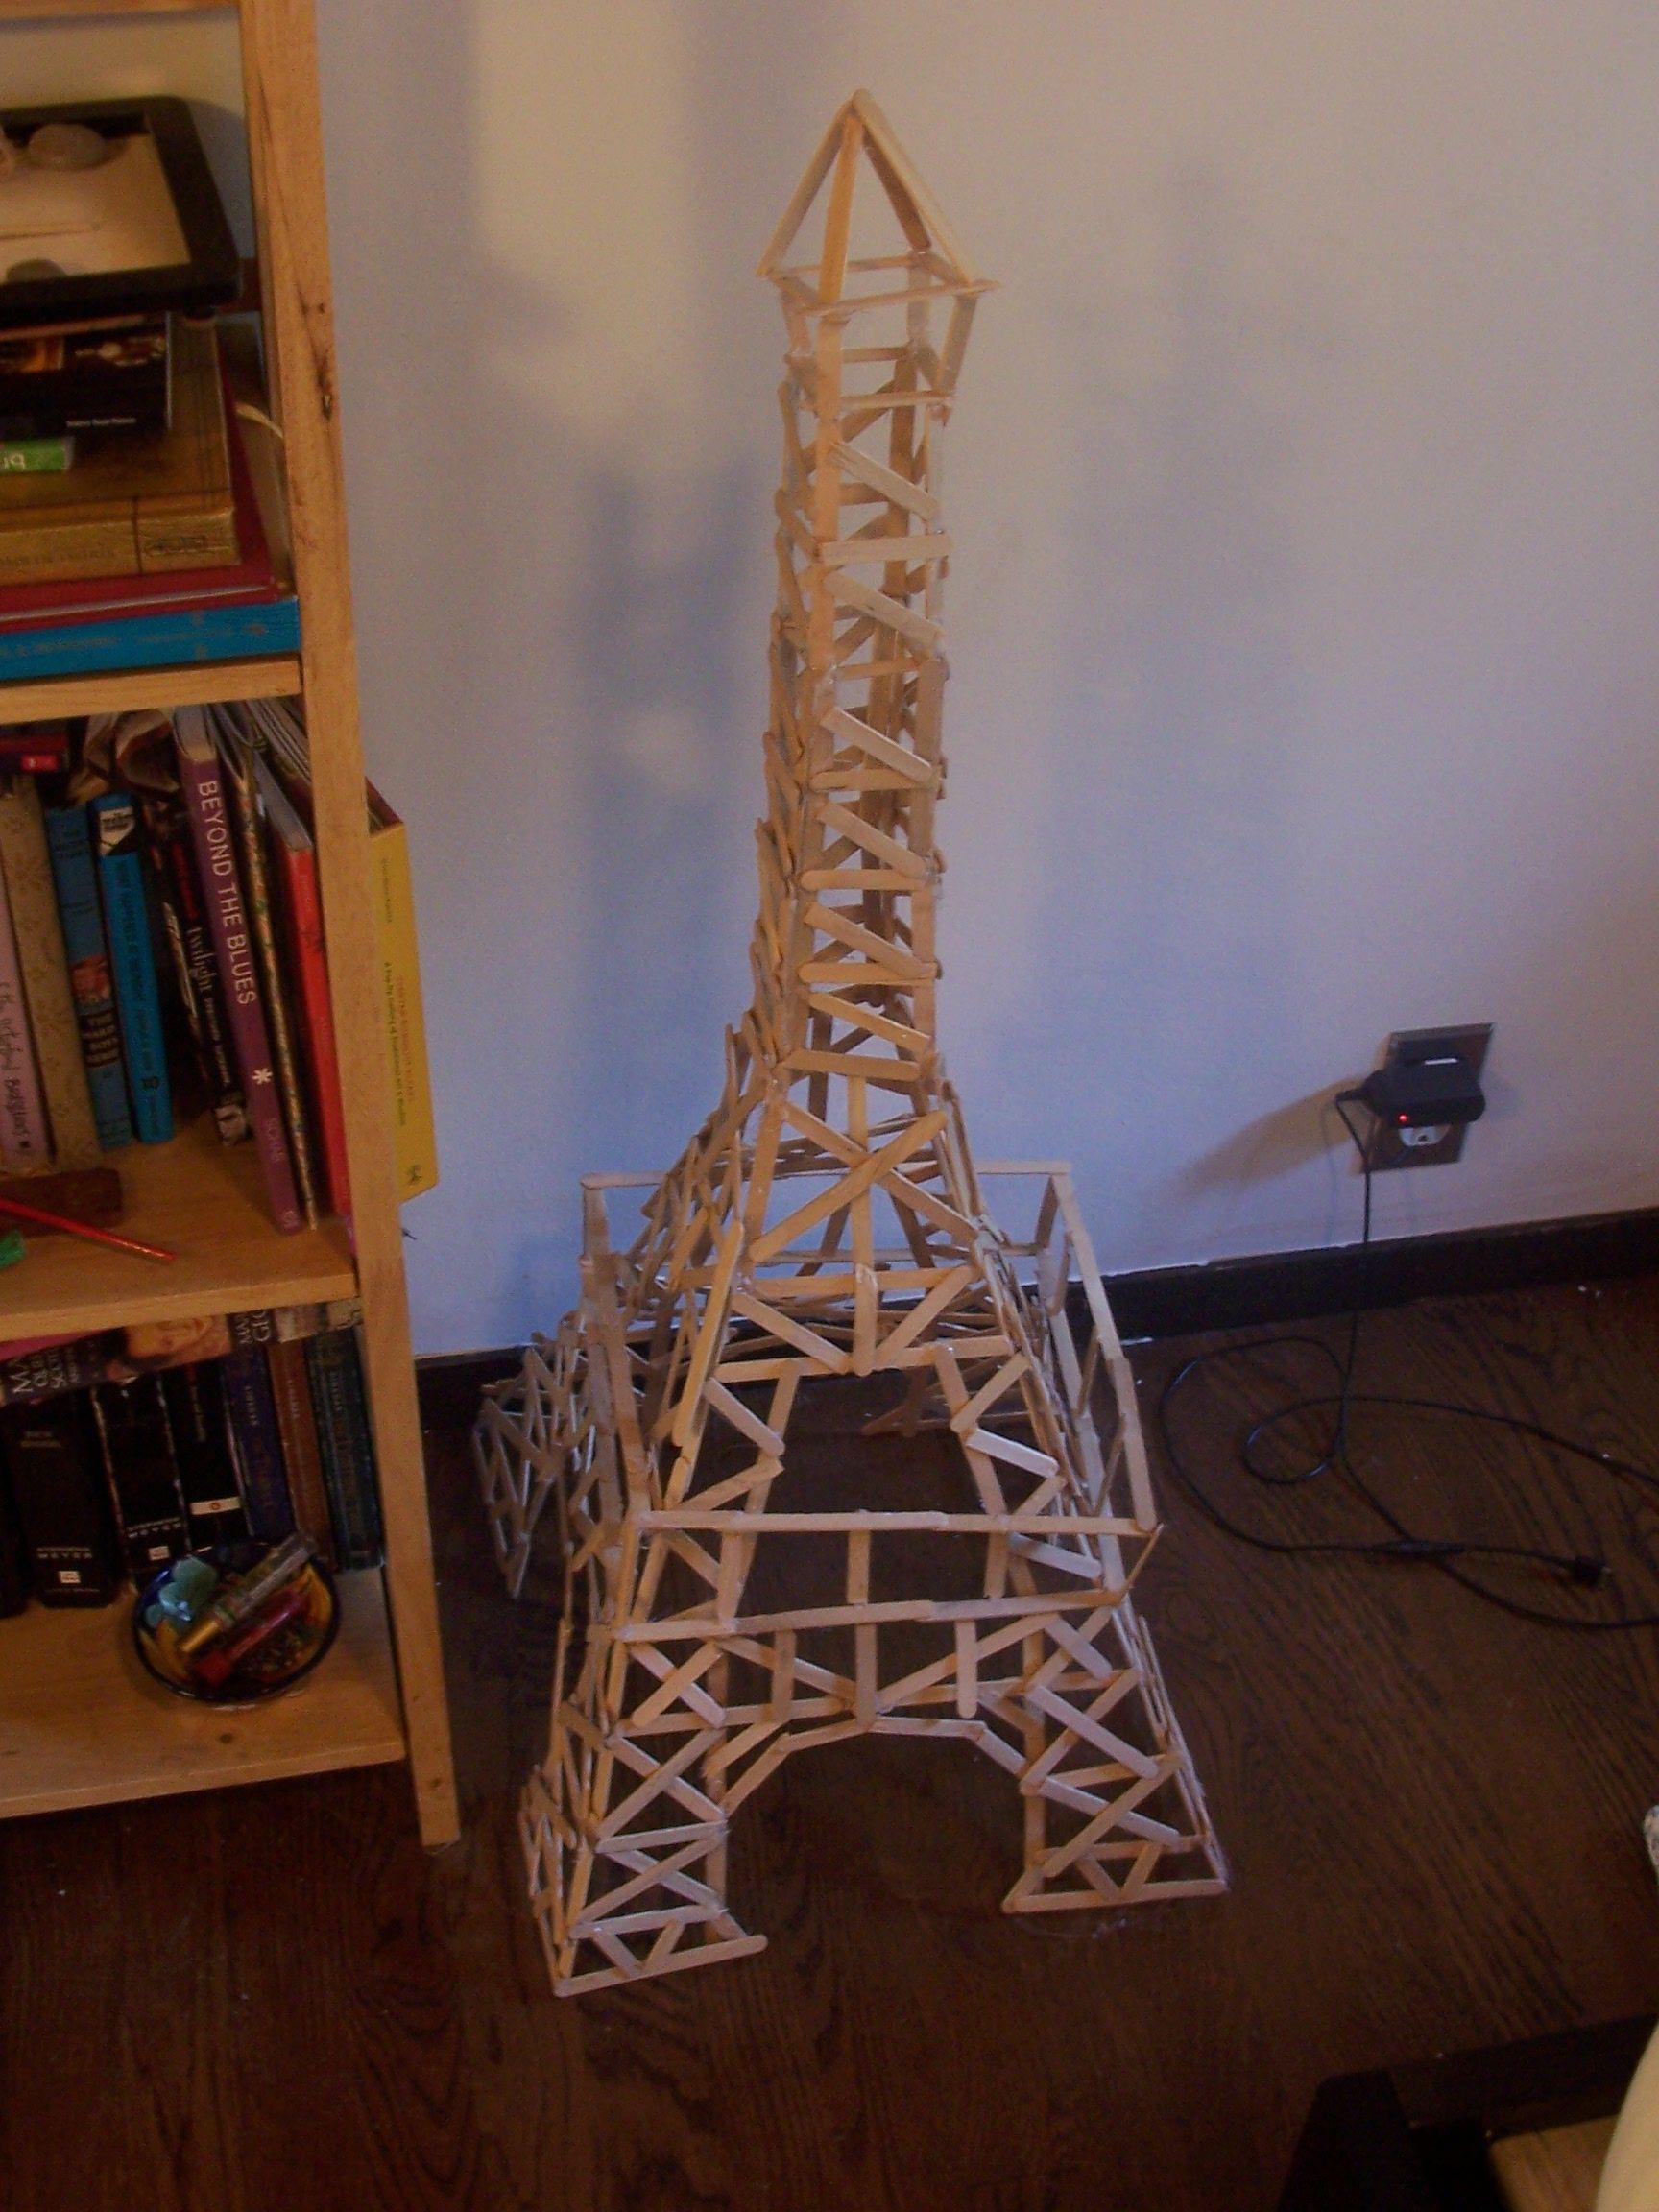 Popsicle Stick Tower Crafts Models Craft